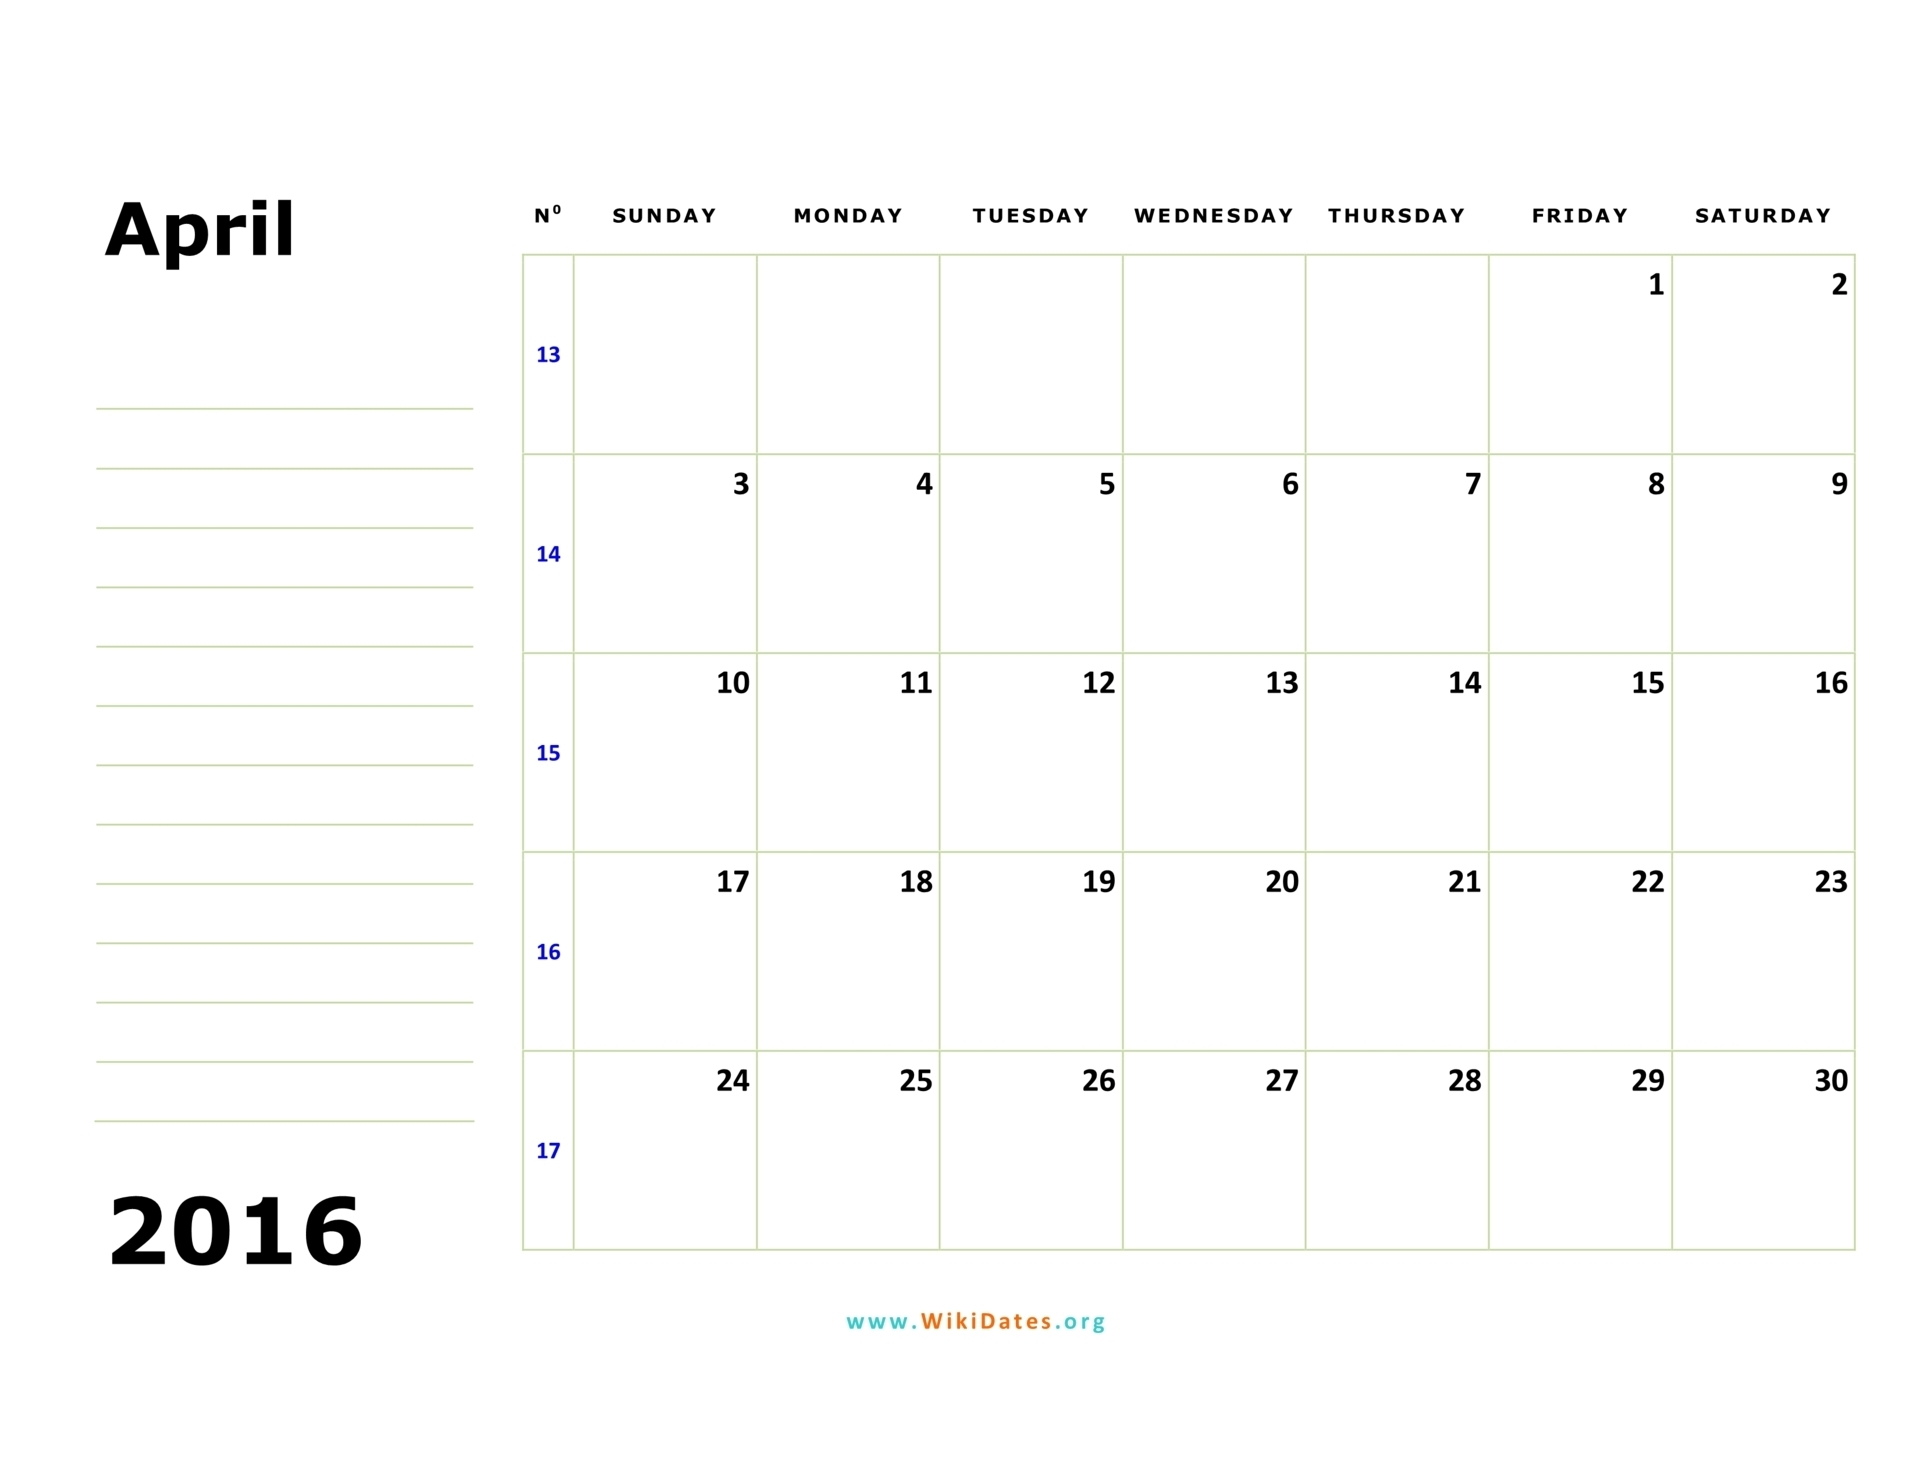 April 2016 Calendar Wikidates3abry